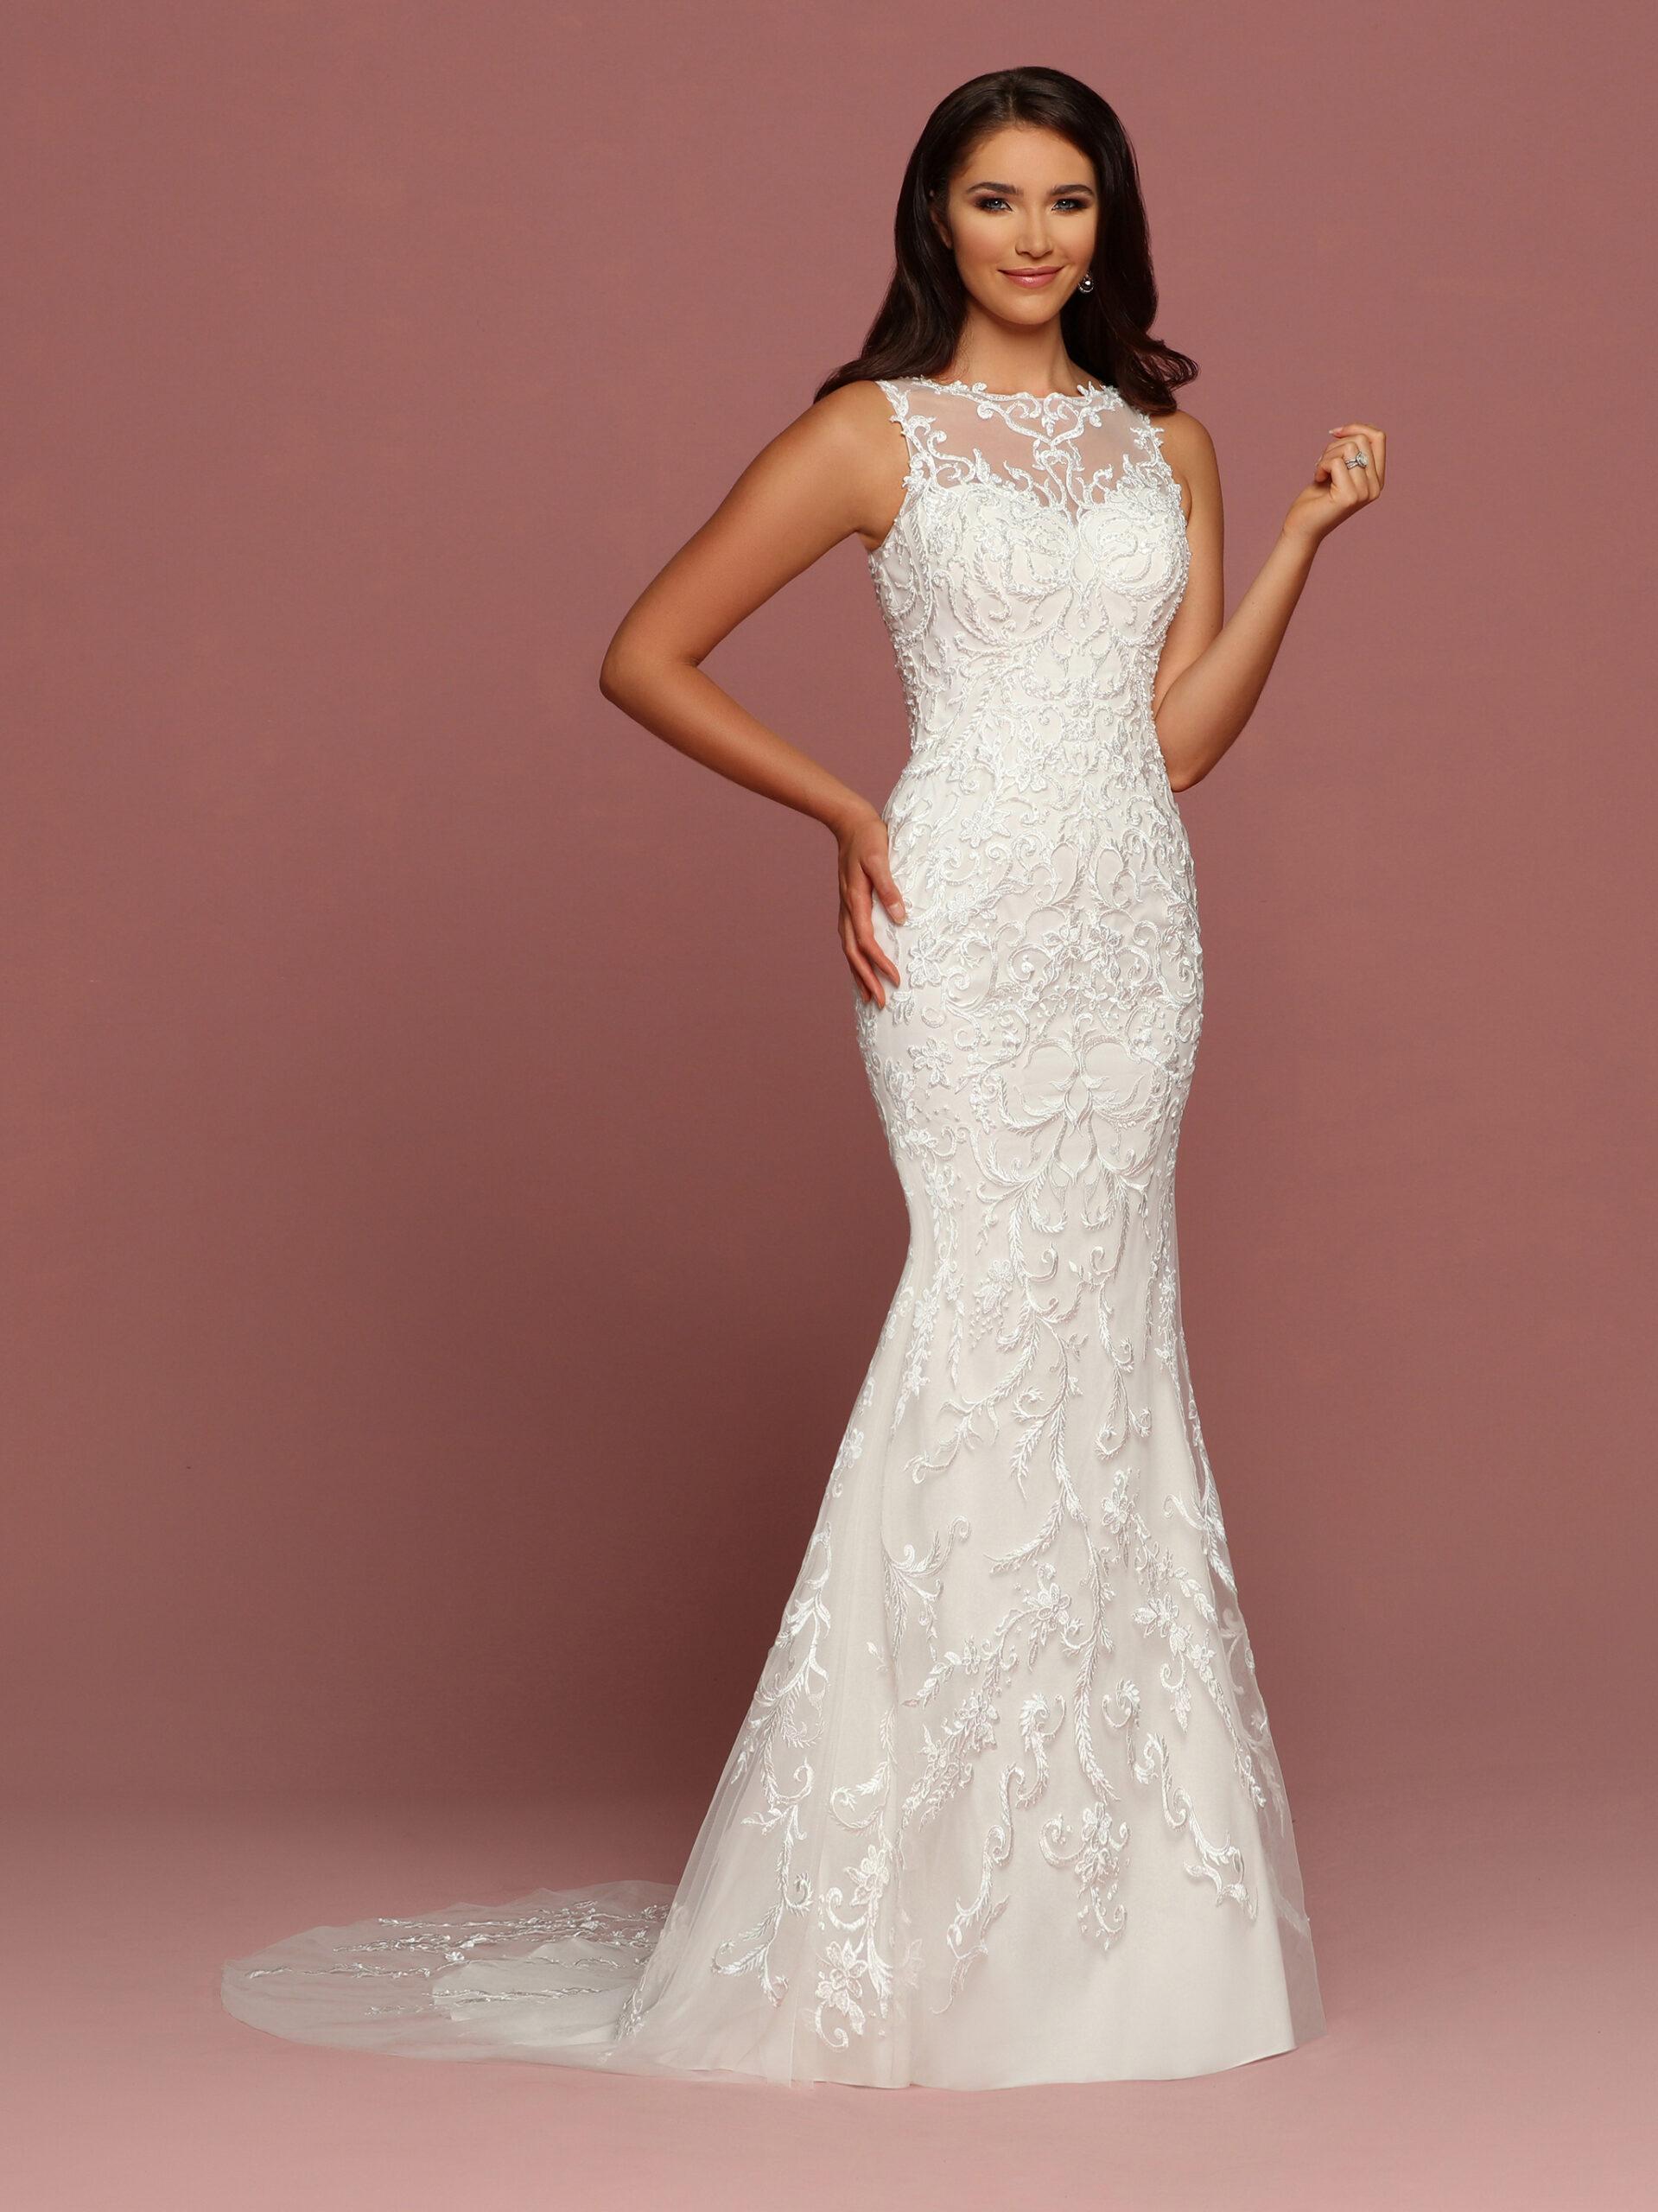 davinci-bridal-gown-03-scaled.jpg